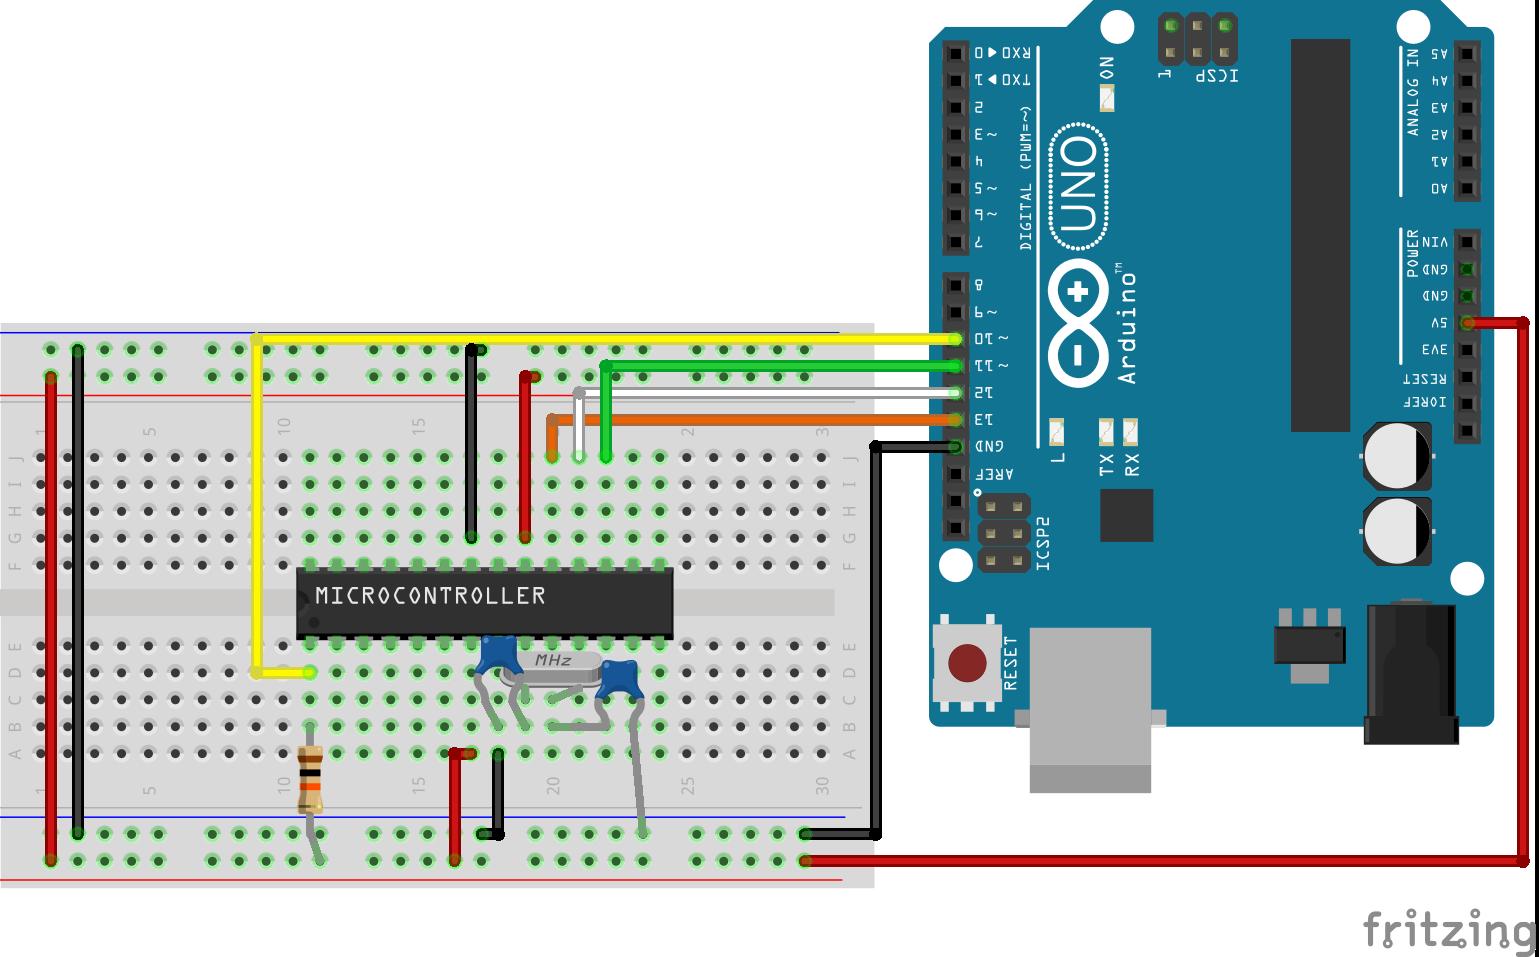 Прошивка загрузчика на микроконтроллере ATMEGA328P